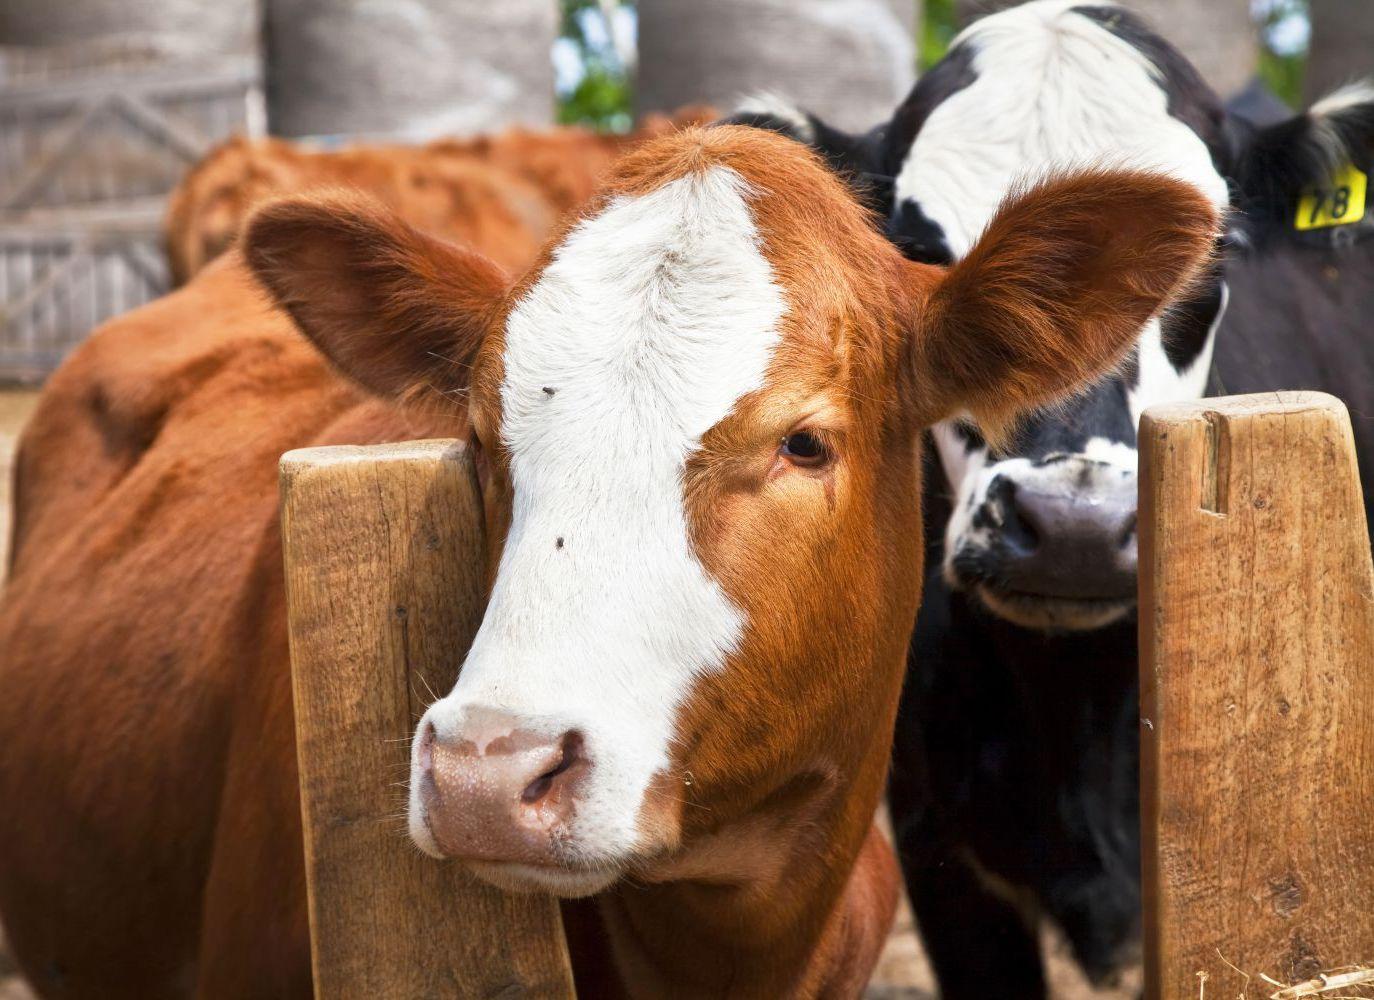 Cattle auctions in Texarkana, TX